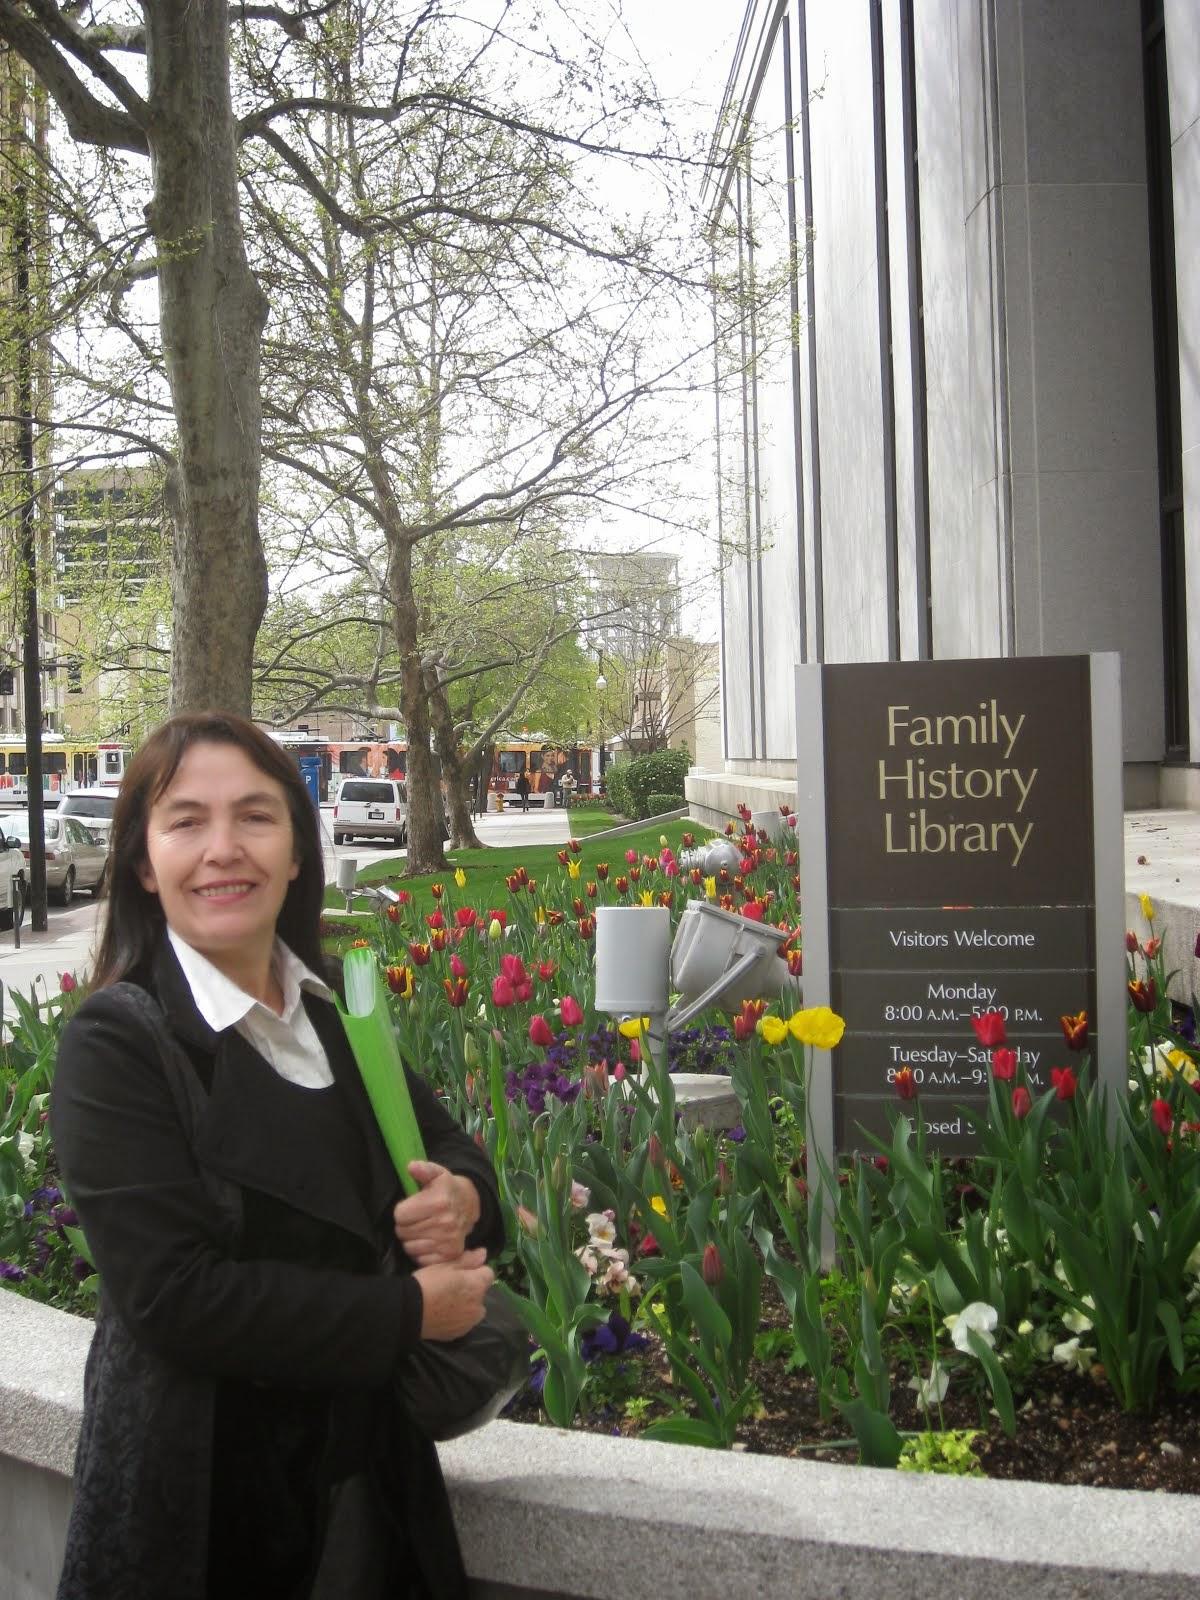 Visita a la Family History Library